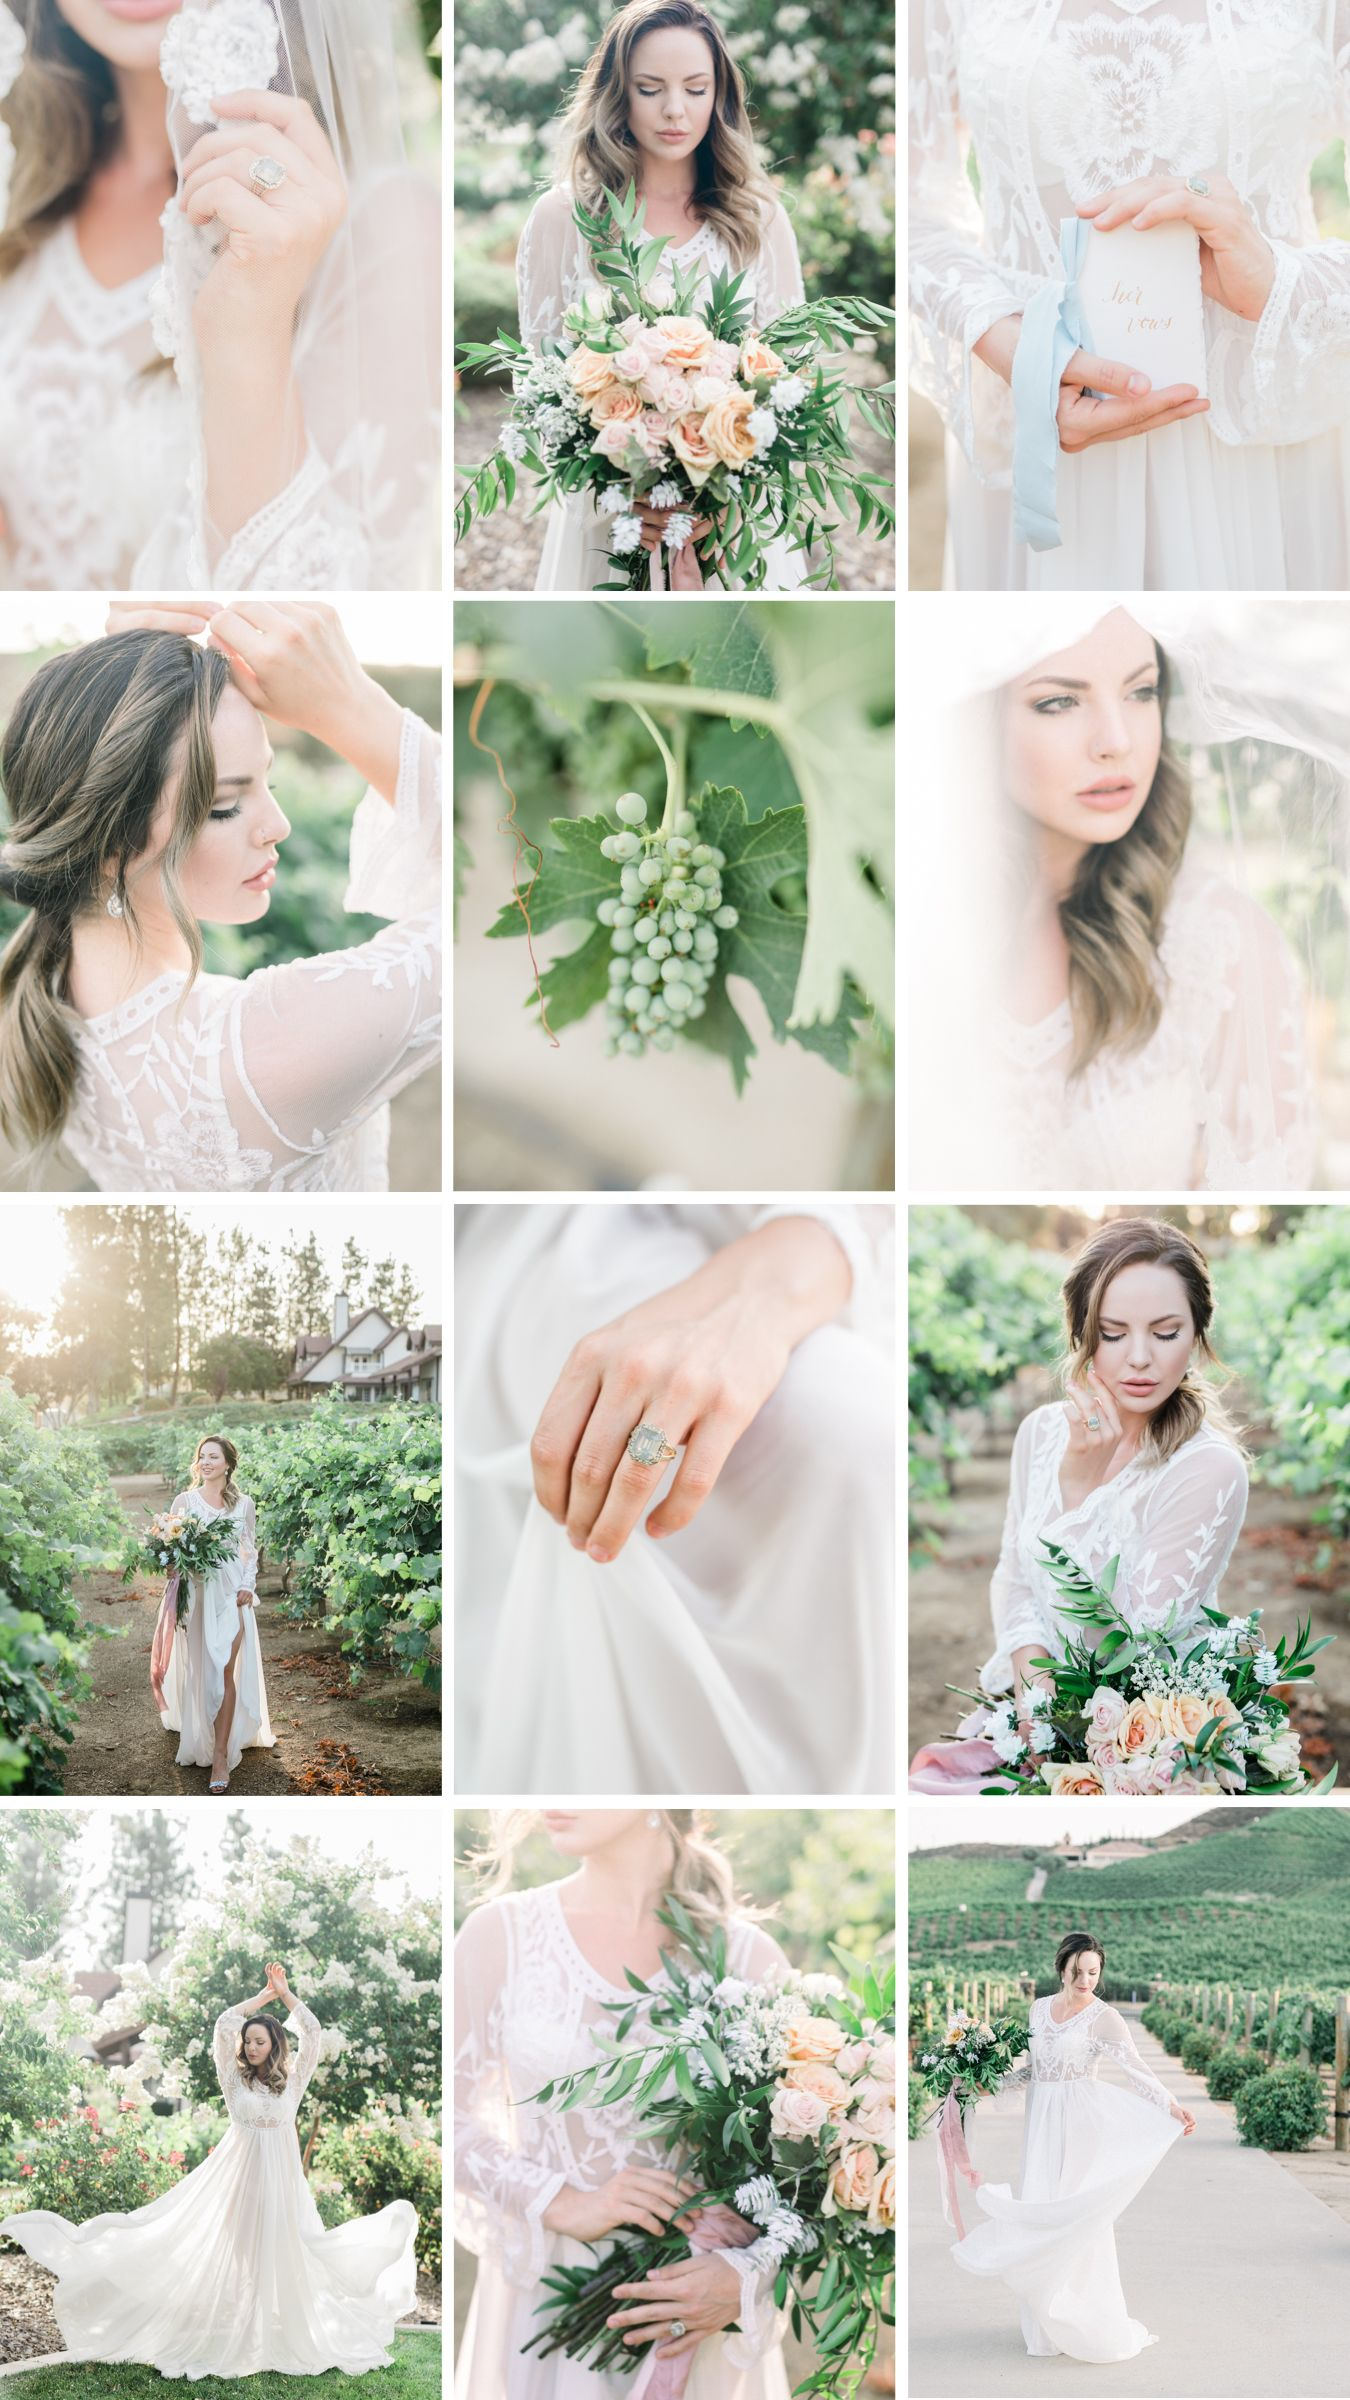 Temecula wedding photographer carrie mcguire carrie mcguire